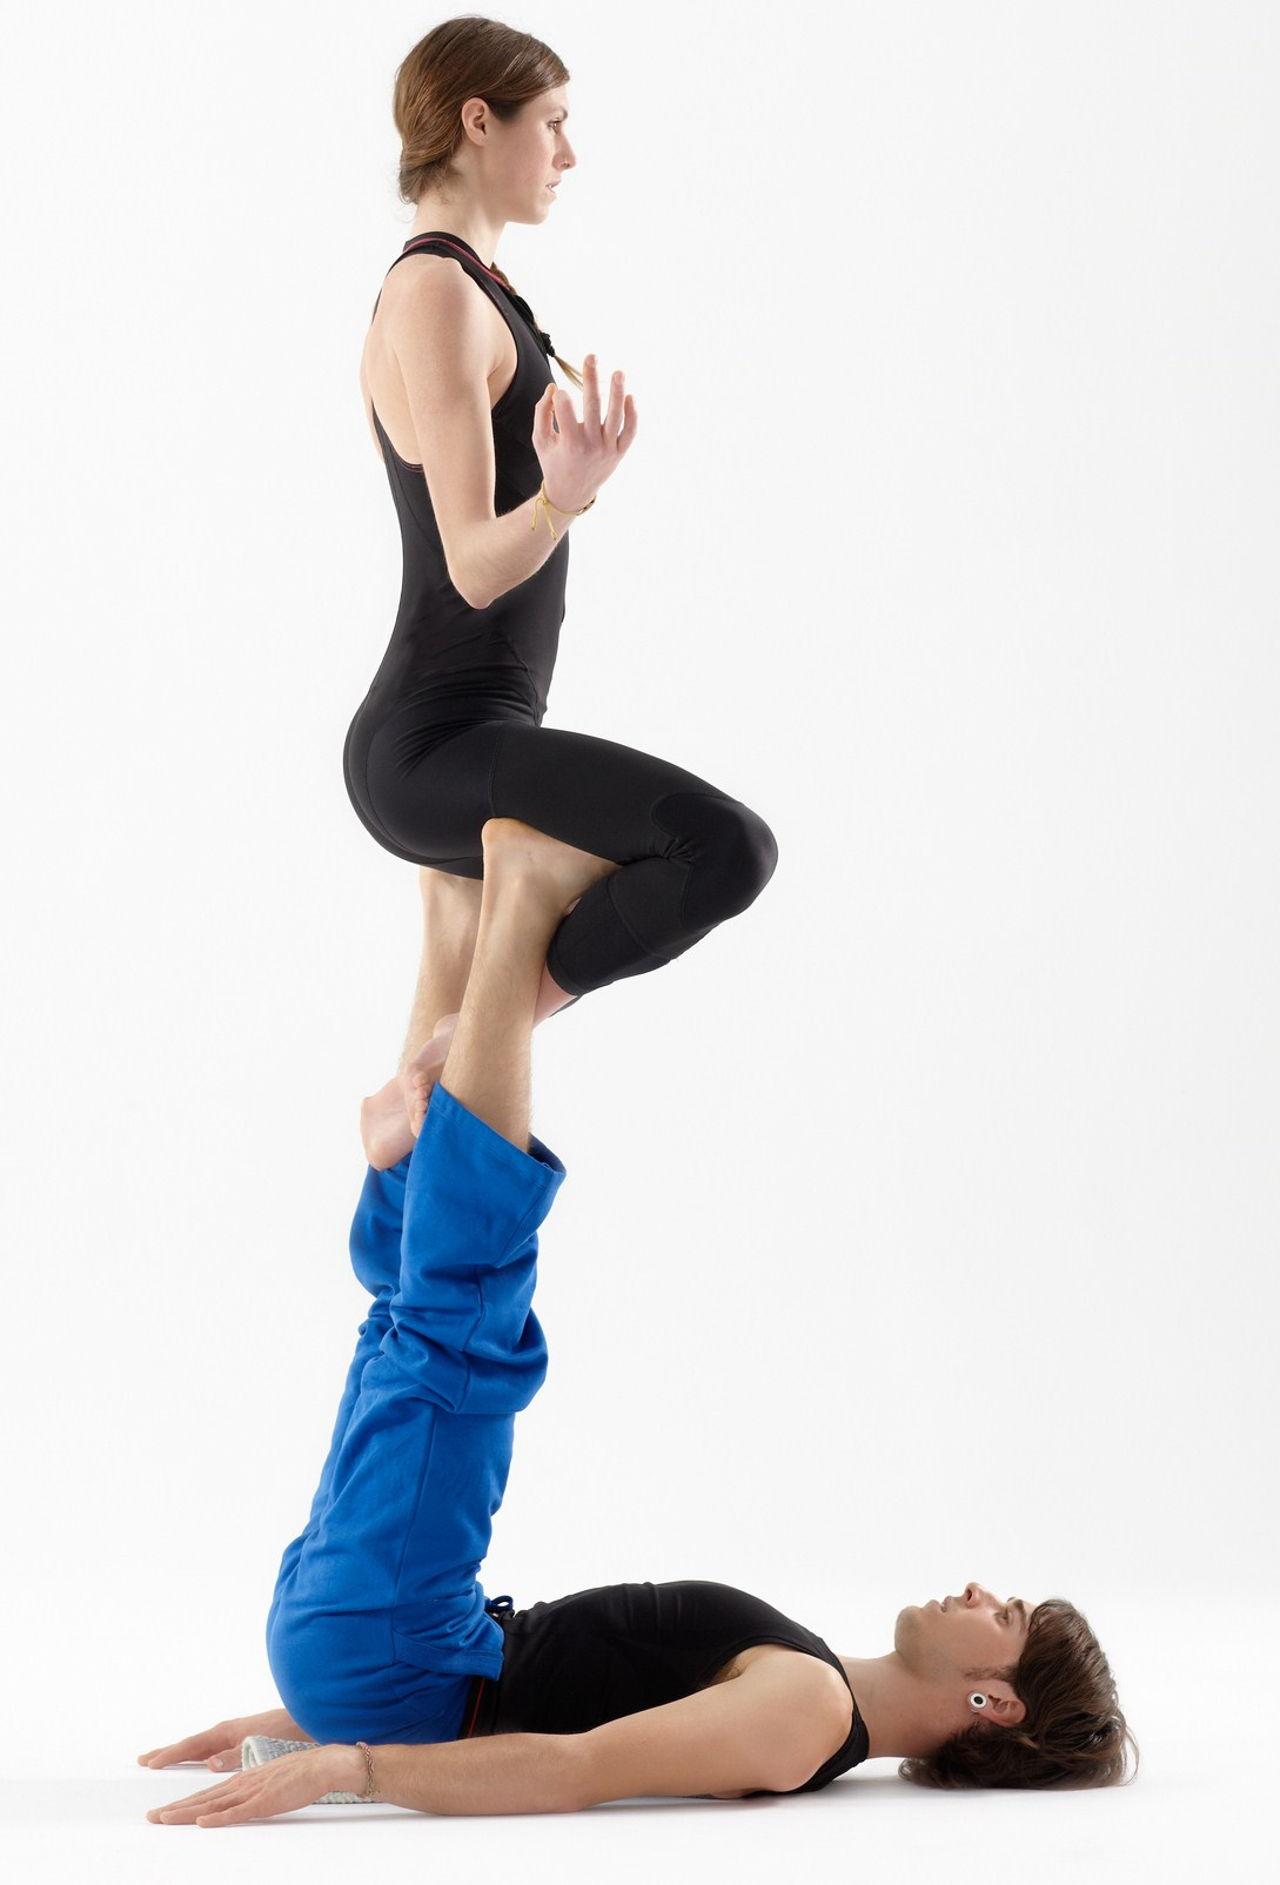 Acro Yoga Position on Basic Dance Steps For Beginners